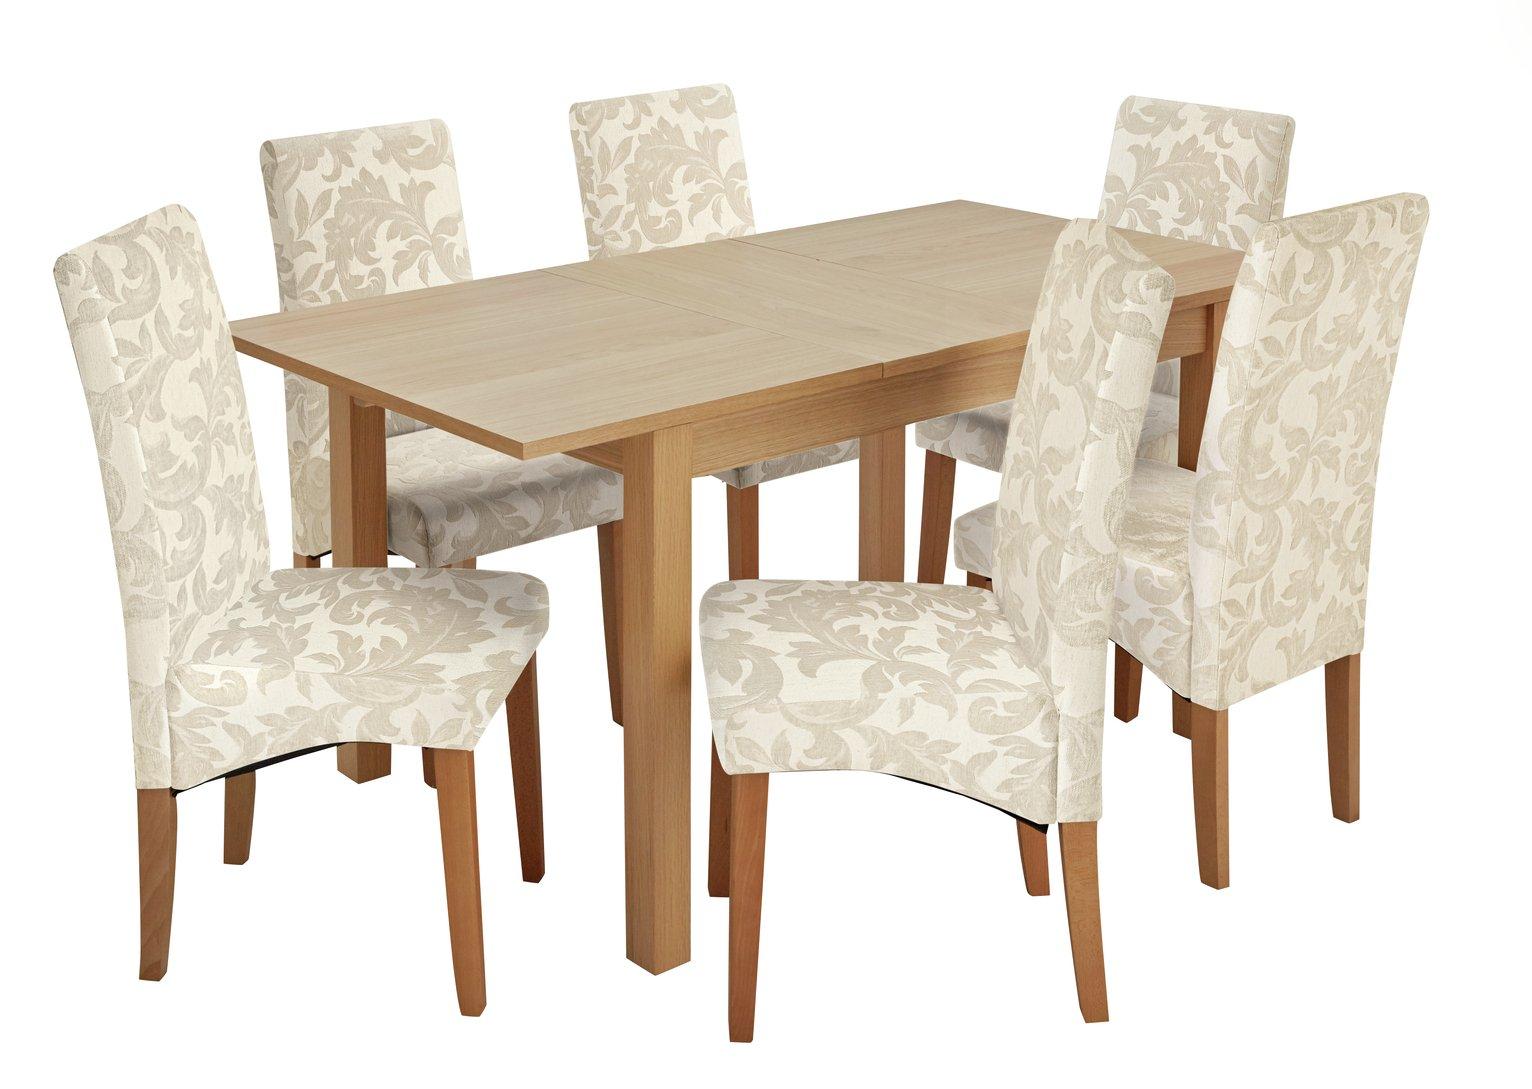 Argos Home Clifton Extending Table & 6 Cream Damask Chairs